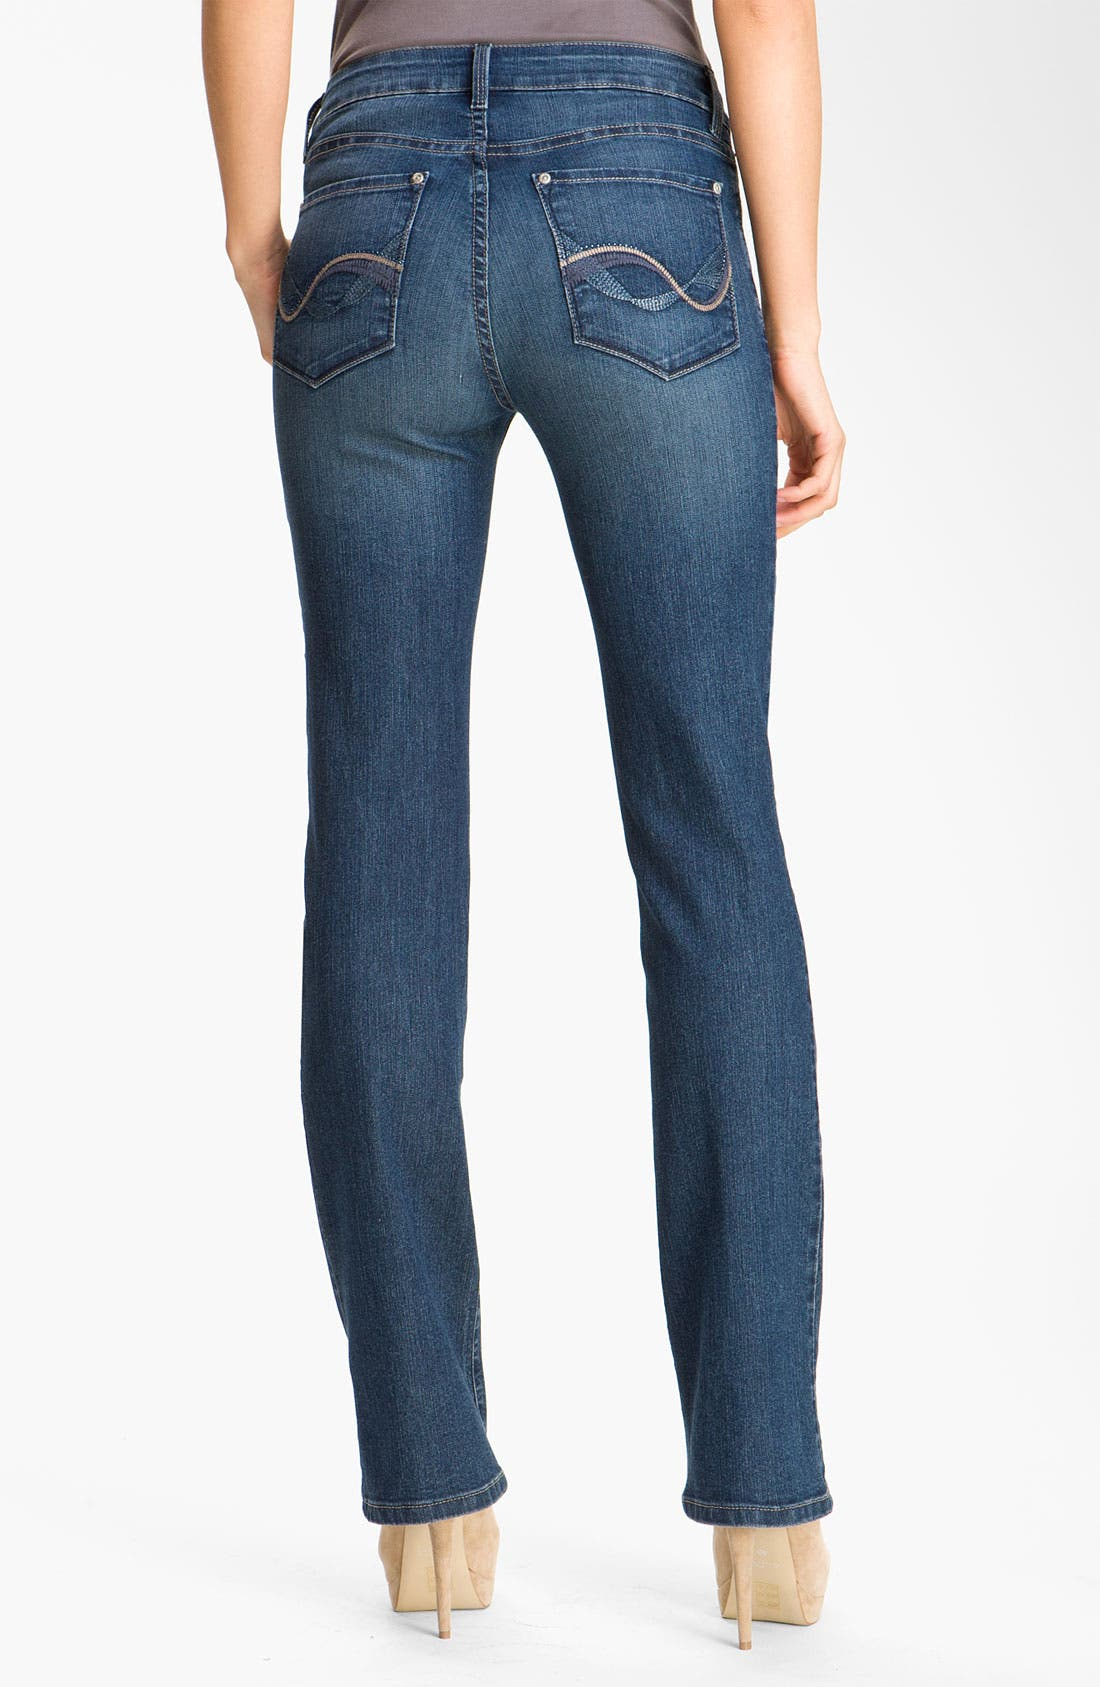 Alternate Image 2  - NYDJ 'Barbara' Embellished Bootcut Stretch Jeans